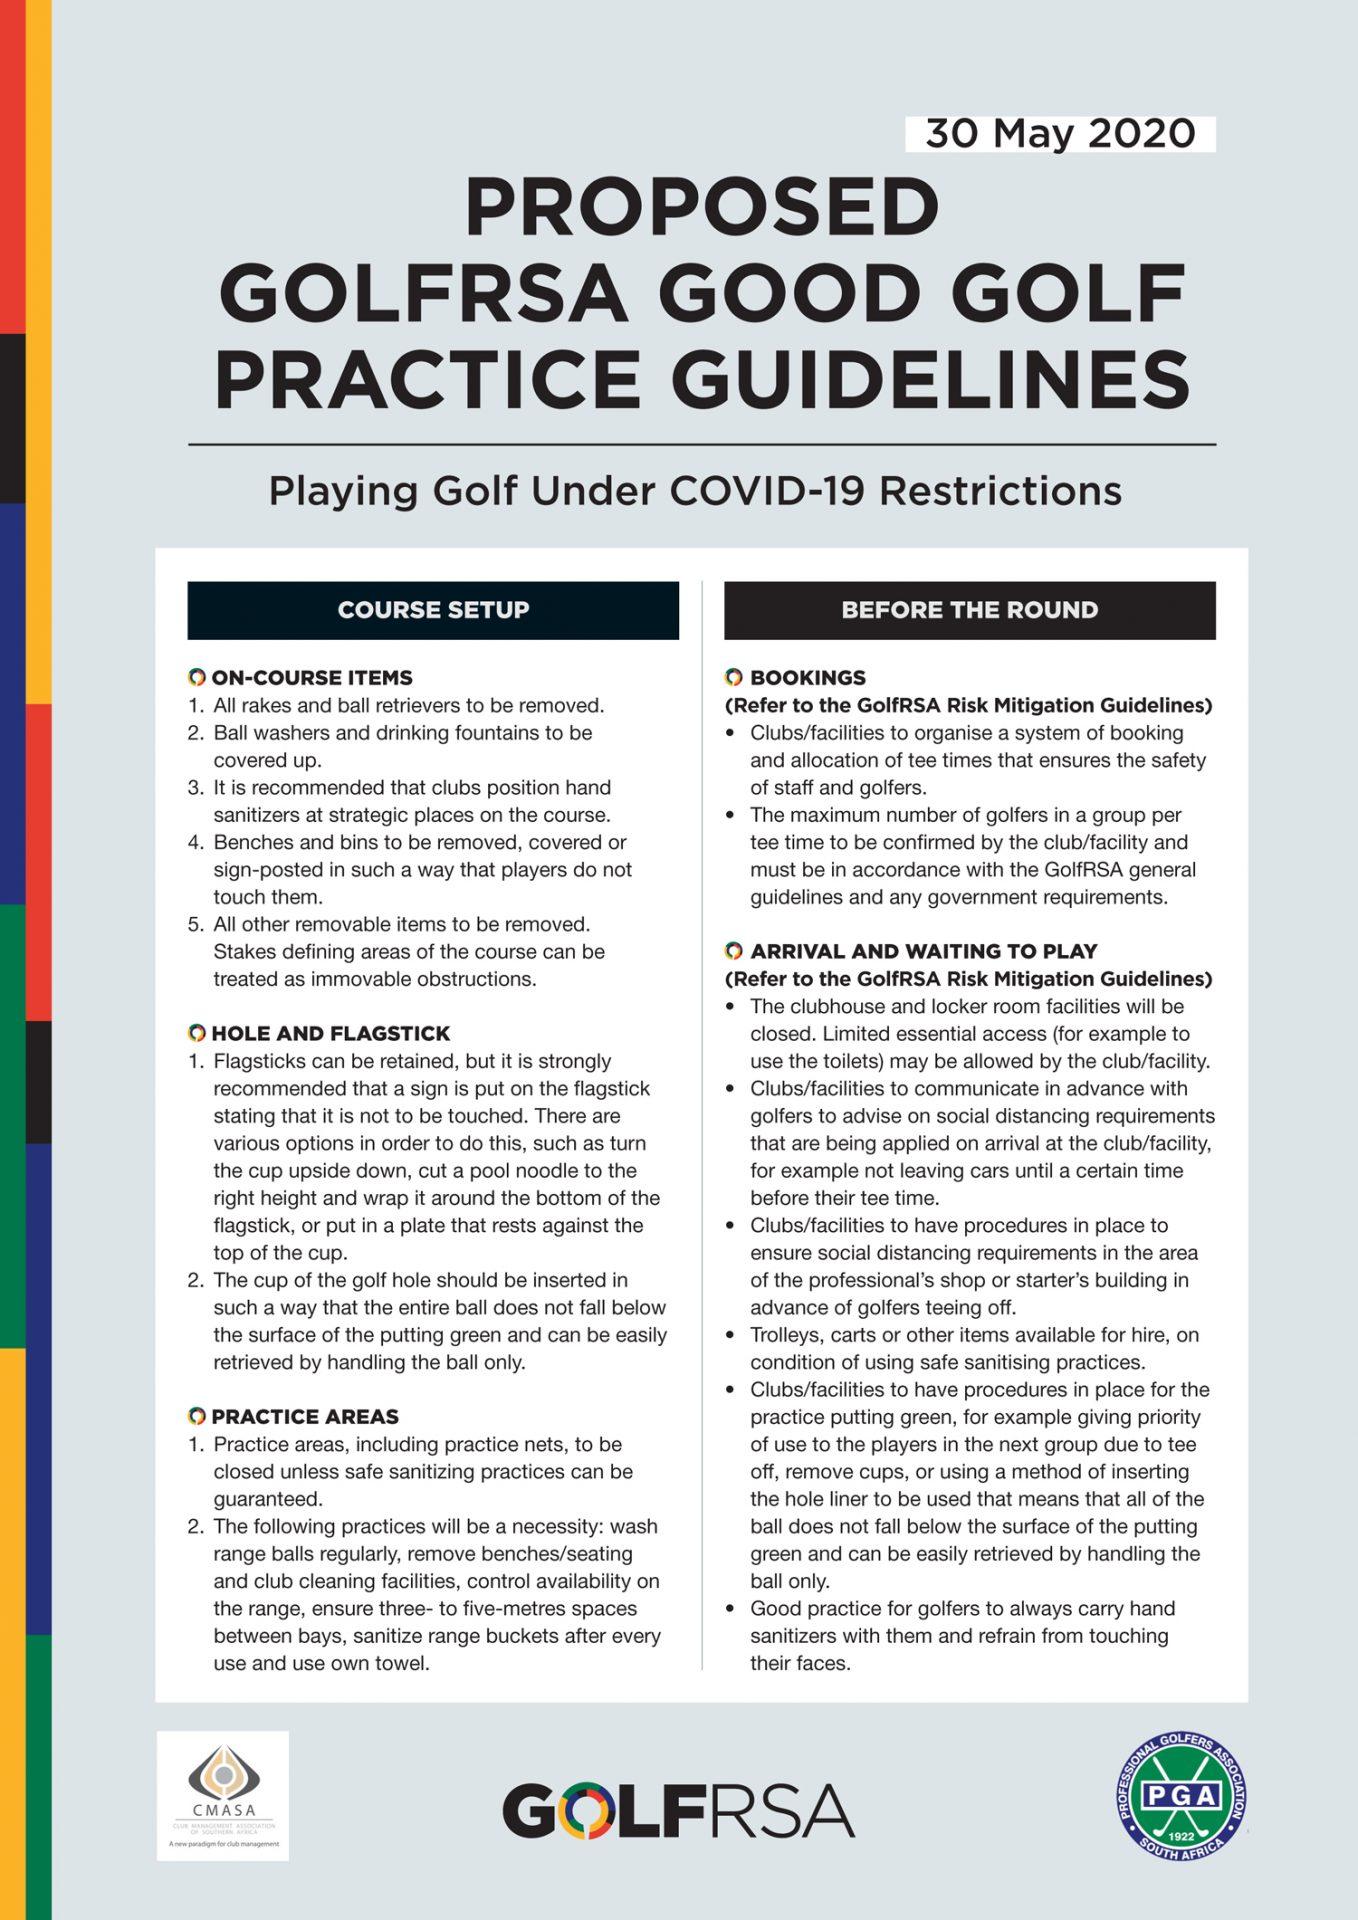 GolfRSA-Good-Practice-Guidelines-V7-1